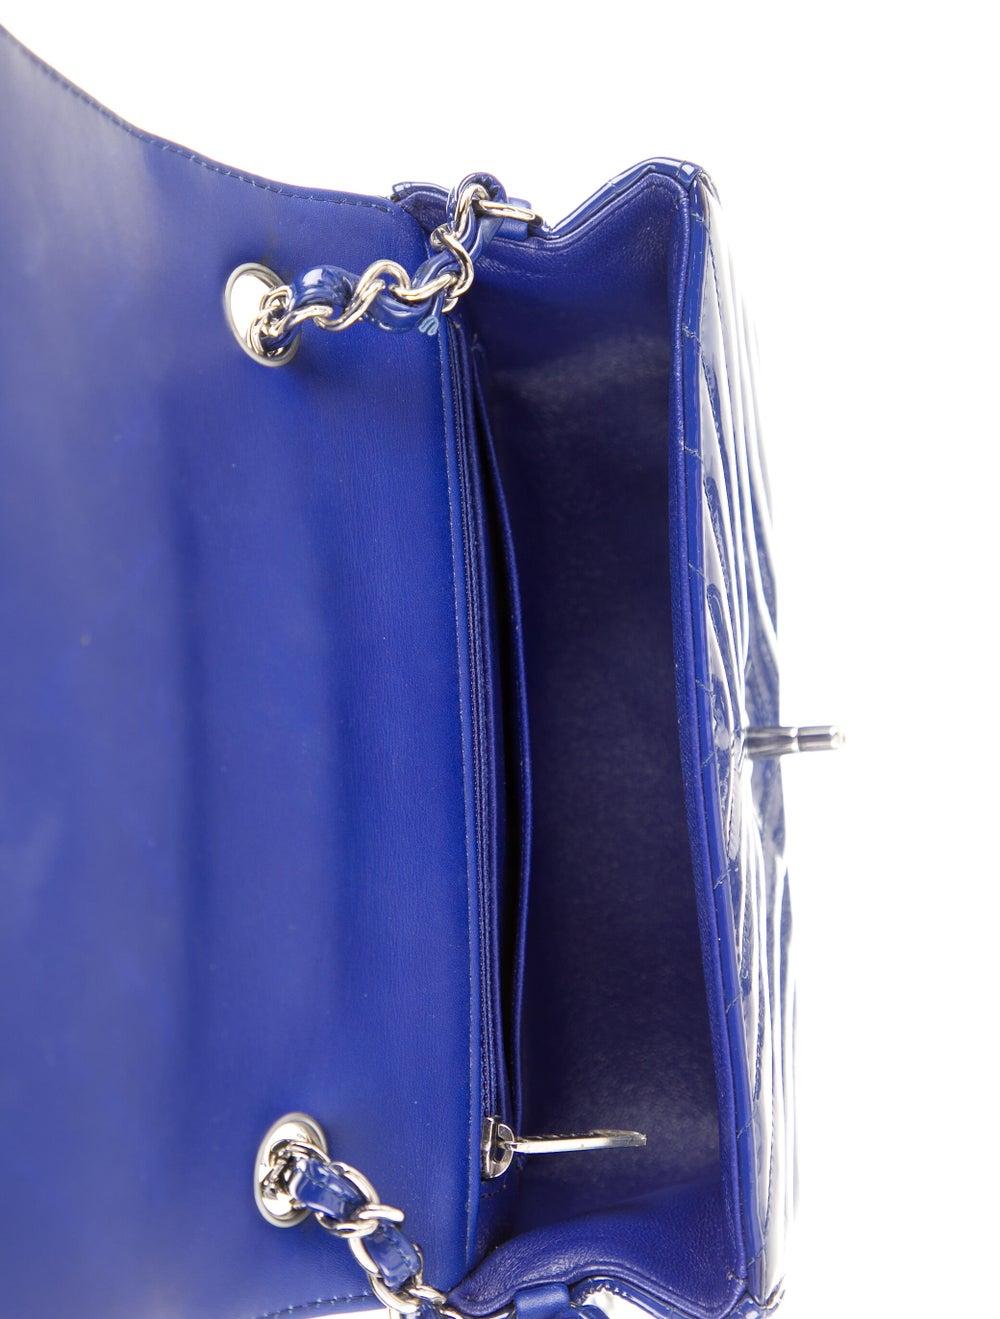 Chanel New Mini Chevron Flap Bag Blue - image 5